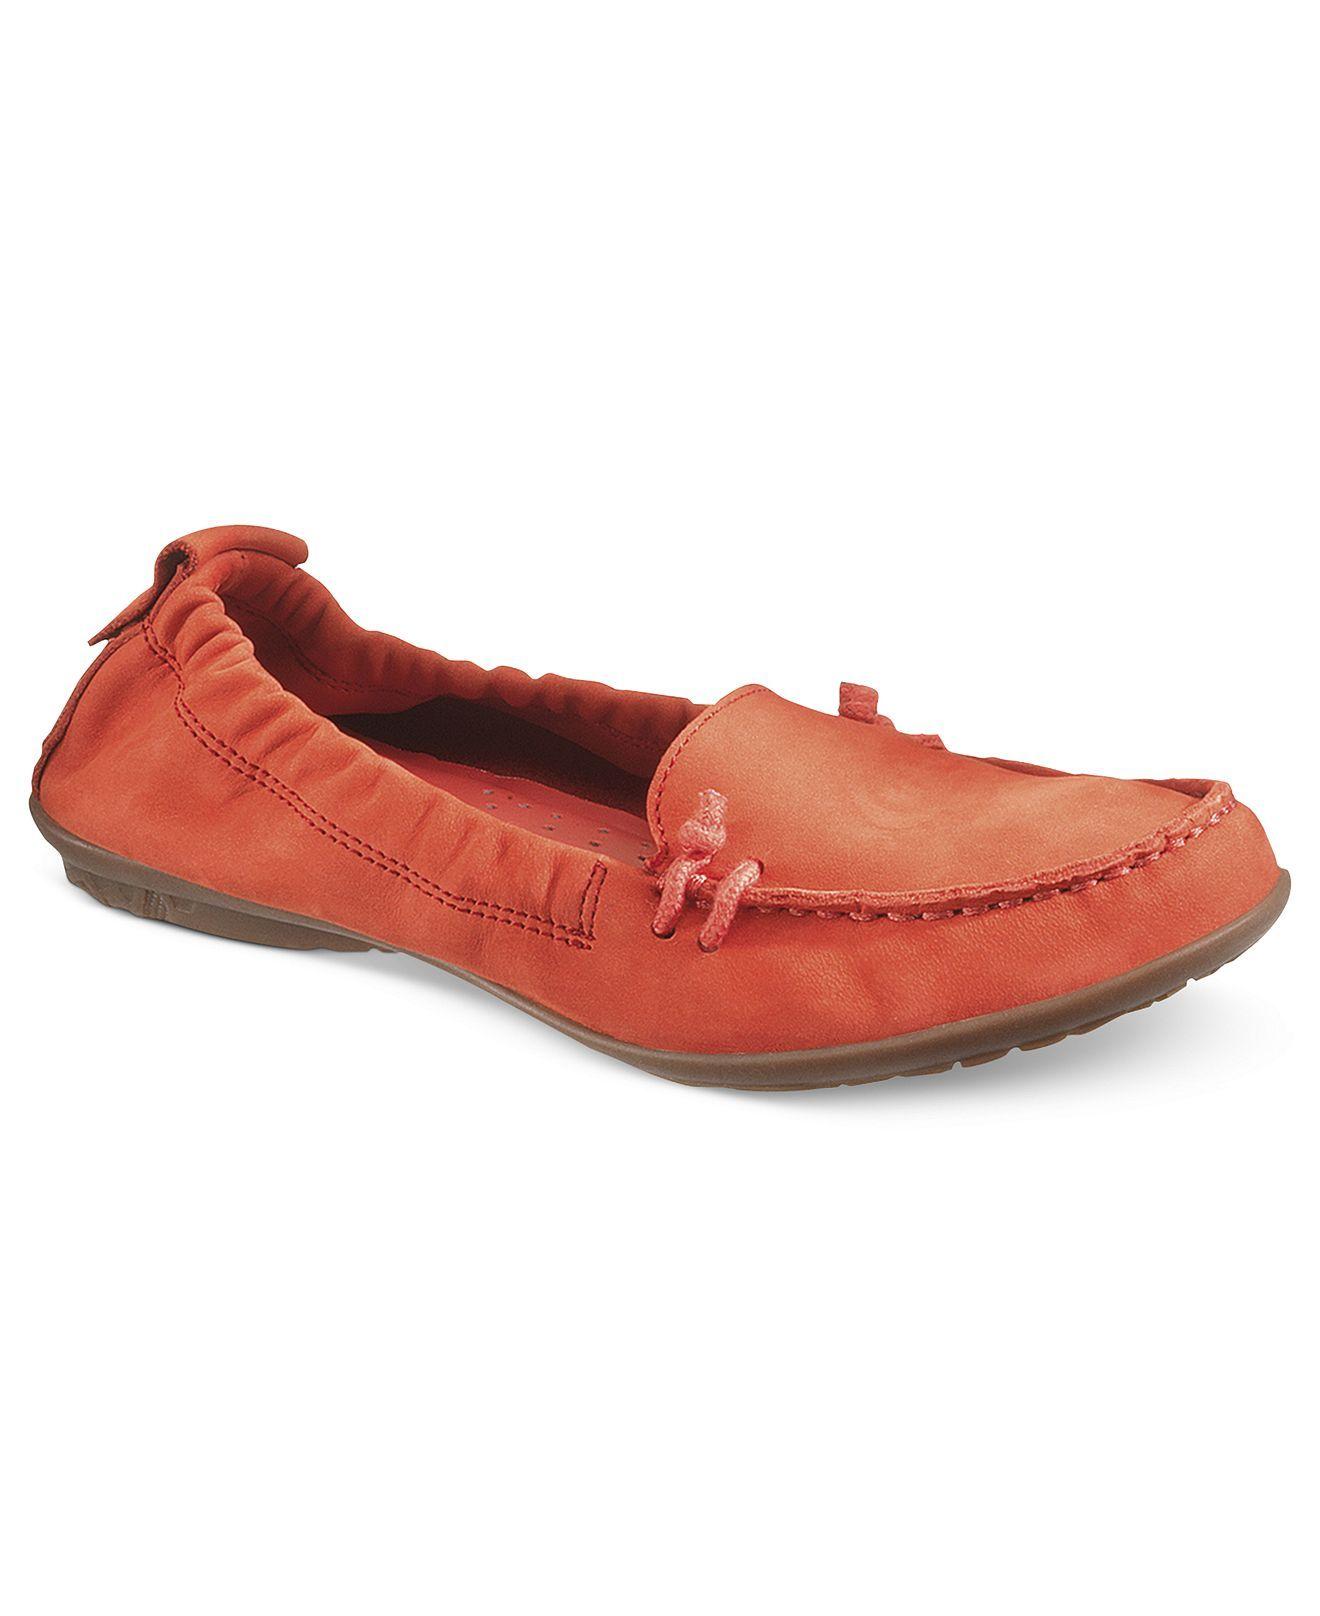 Hush Puppies Women S Shoes Ceil Moc Flats Hush Puppies Shoes Macy S Hush Puppies Women Dress Shoes Men Hush Puppies Shoes